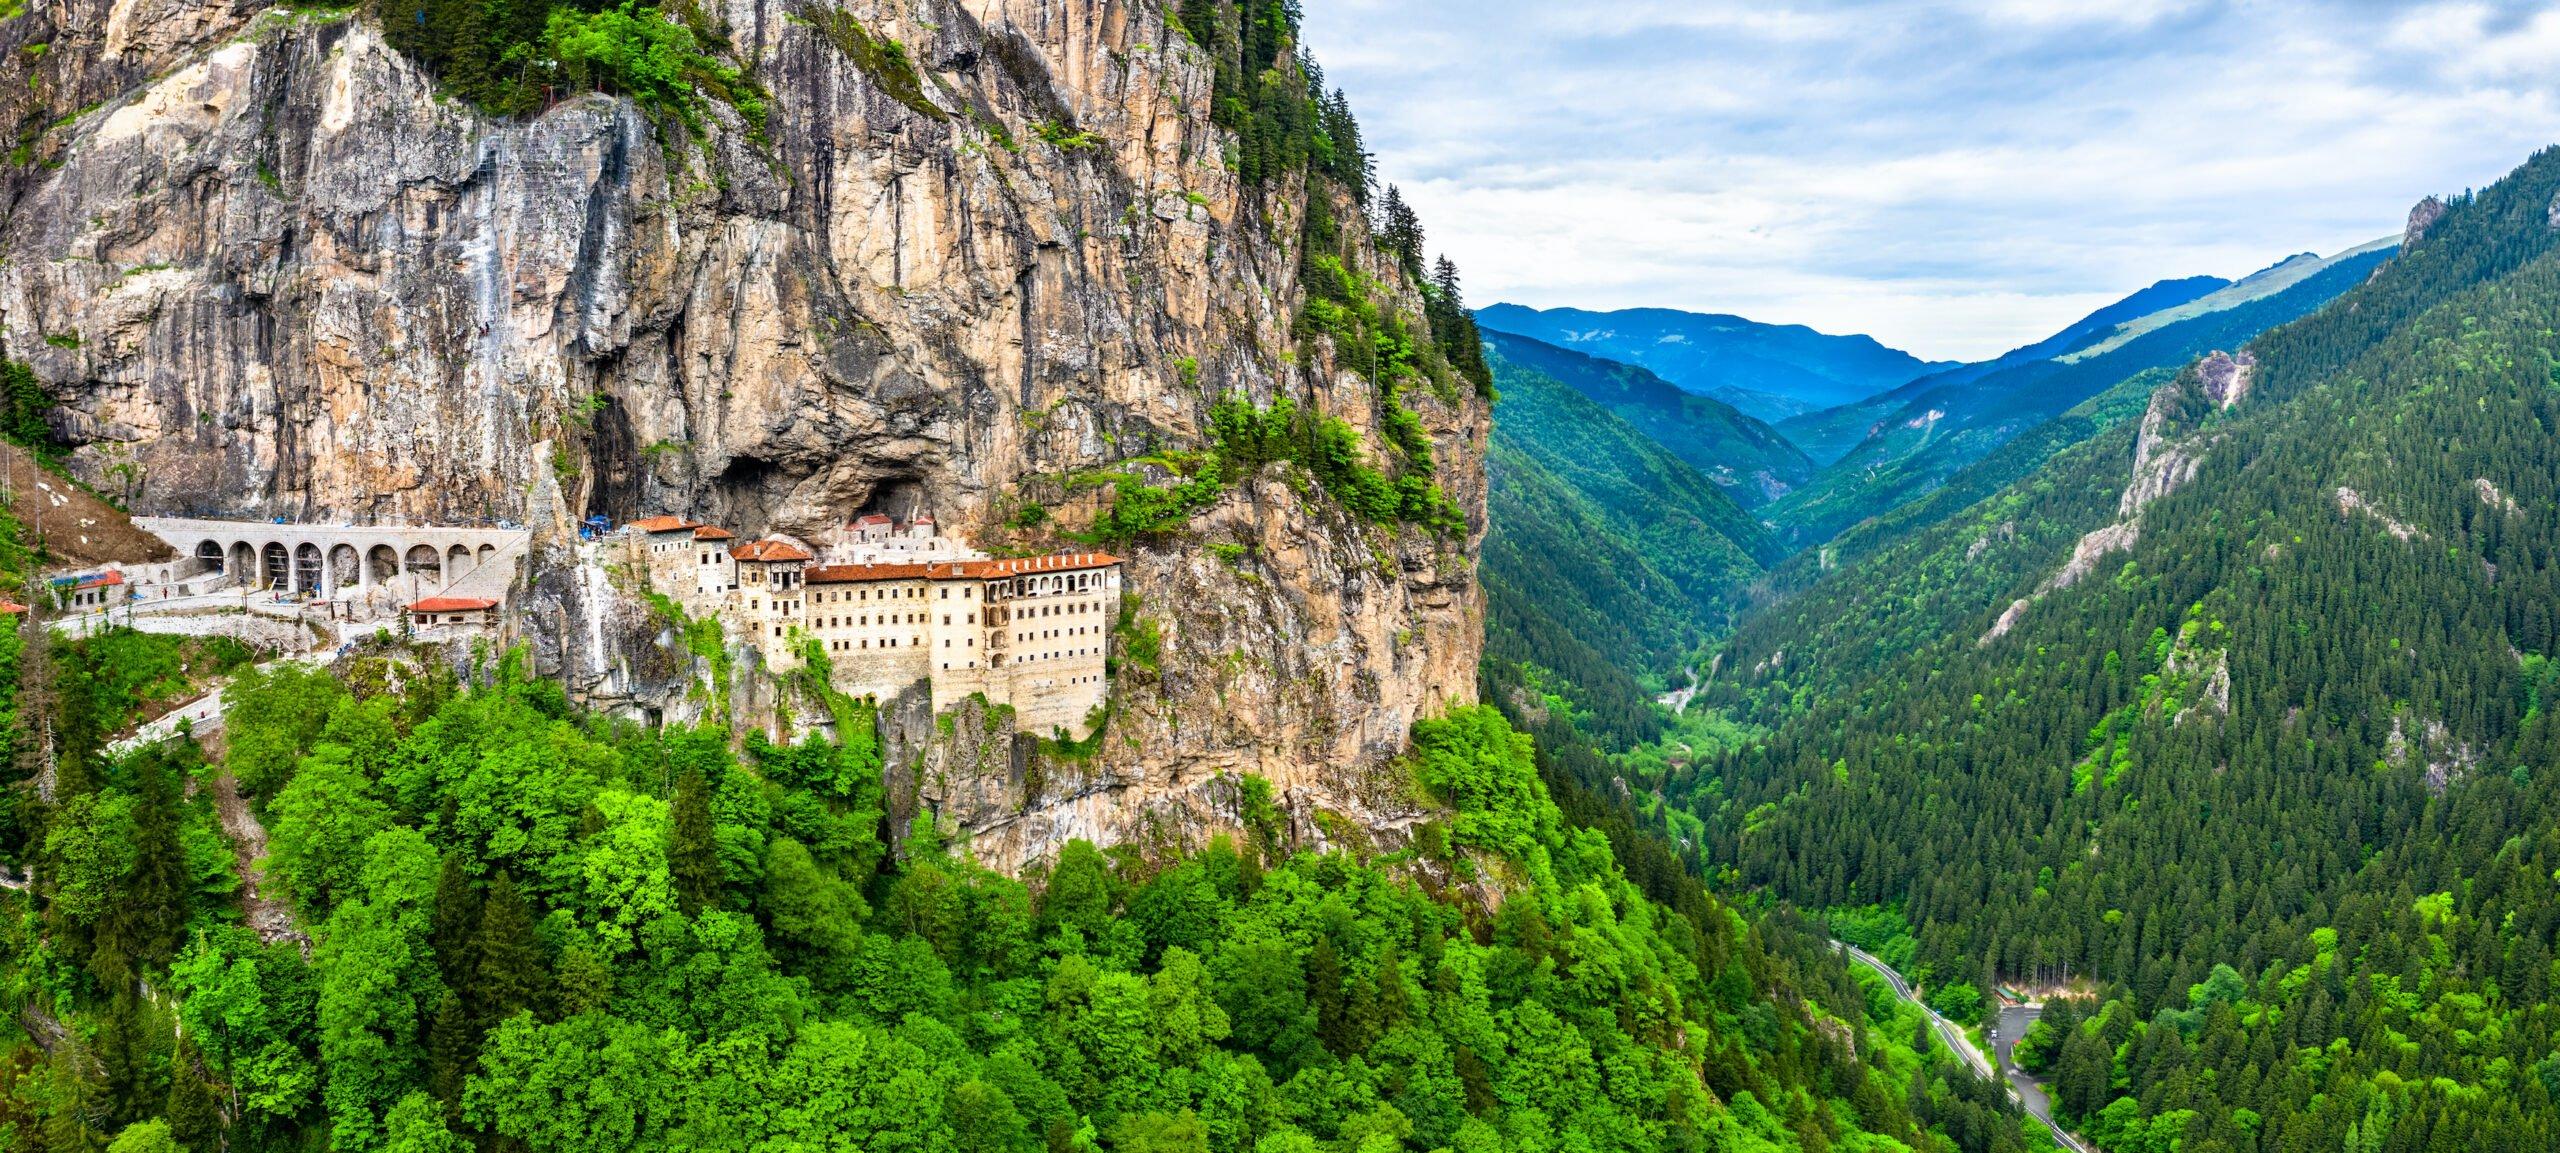 Sumela Monastery Tour From Trabzon